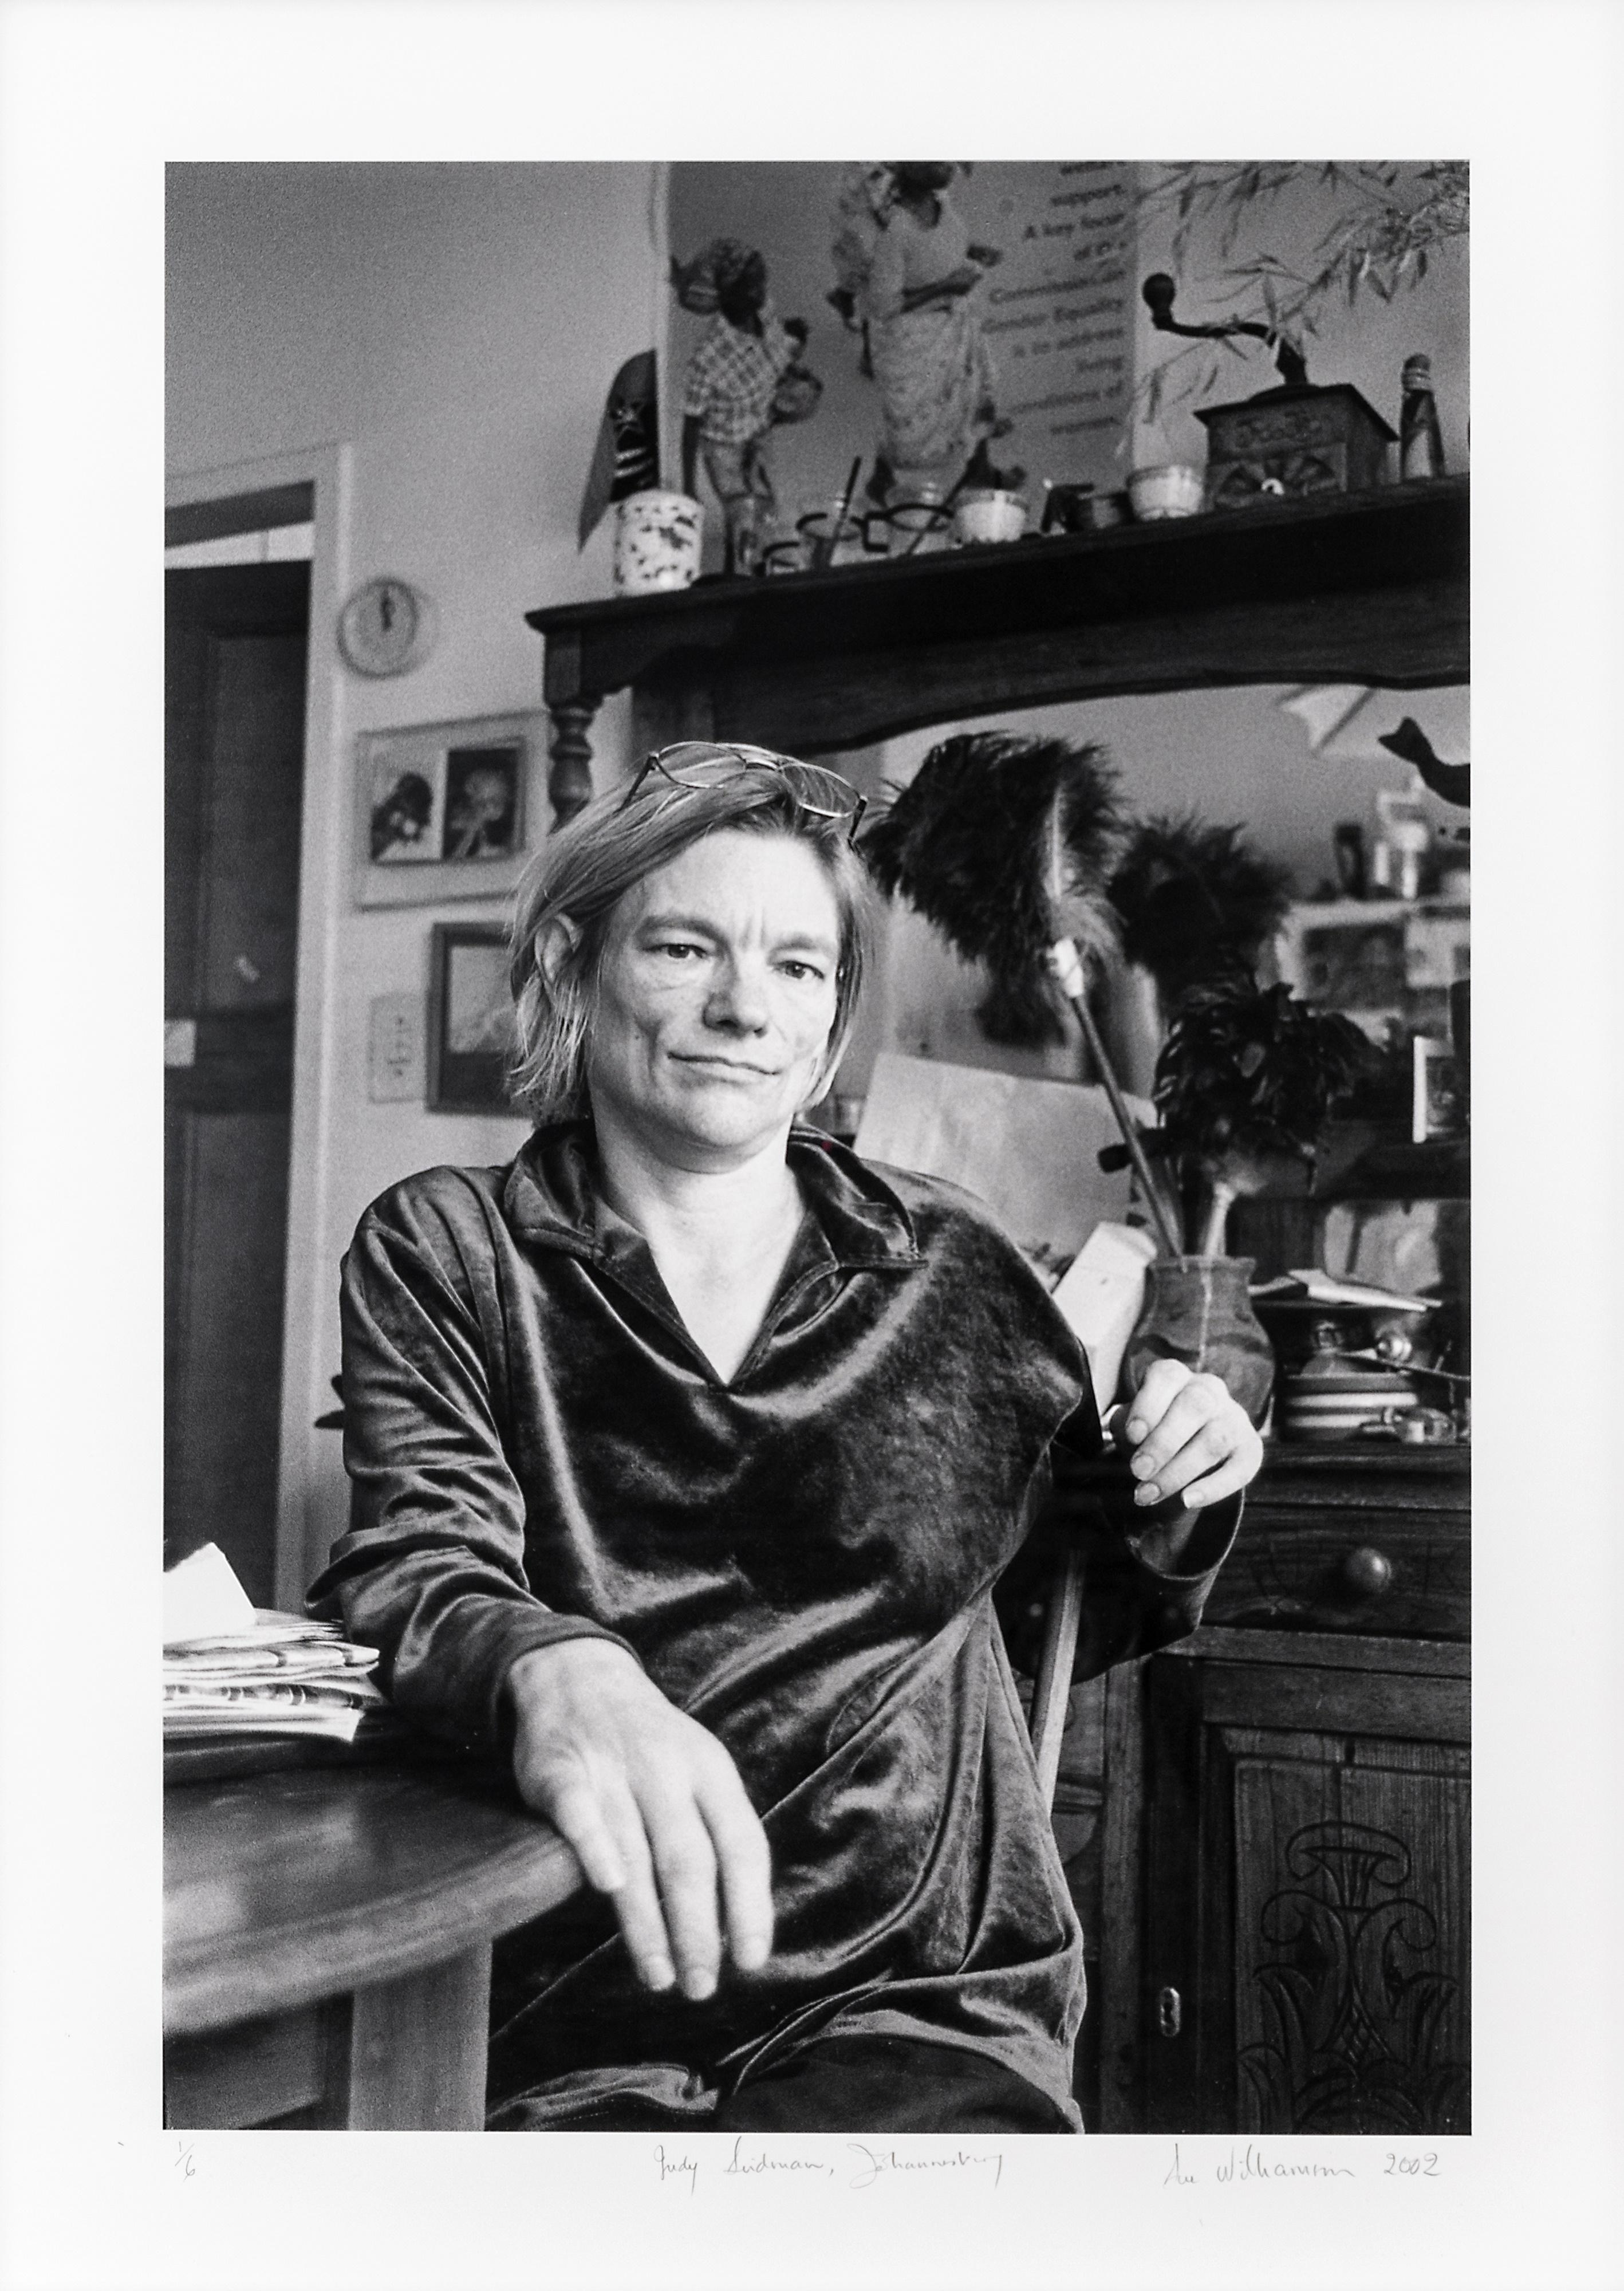 Sue Williamson (South Africa 1941-) Judy Seidman, Johannesburg, 2002